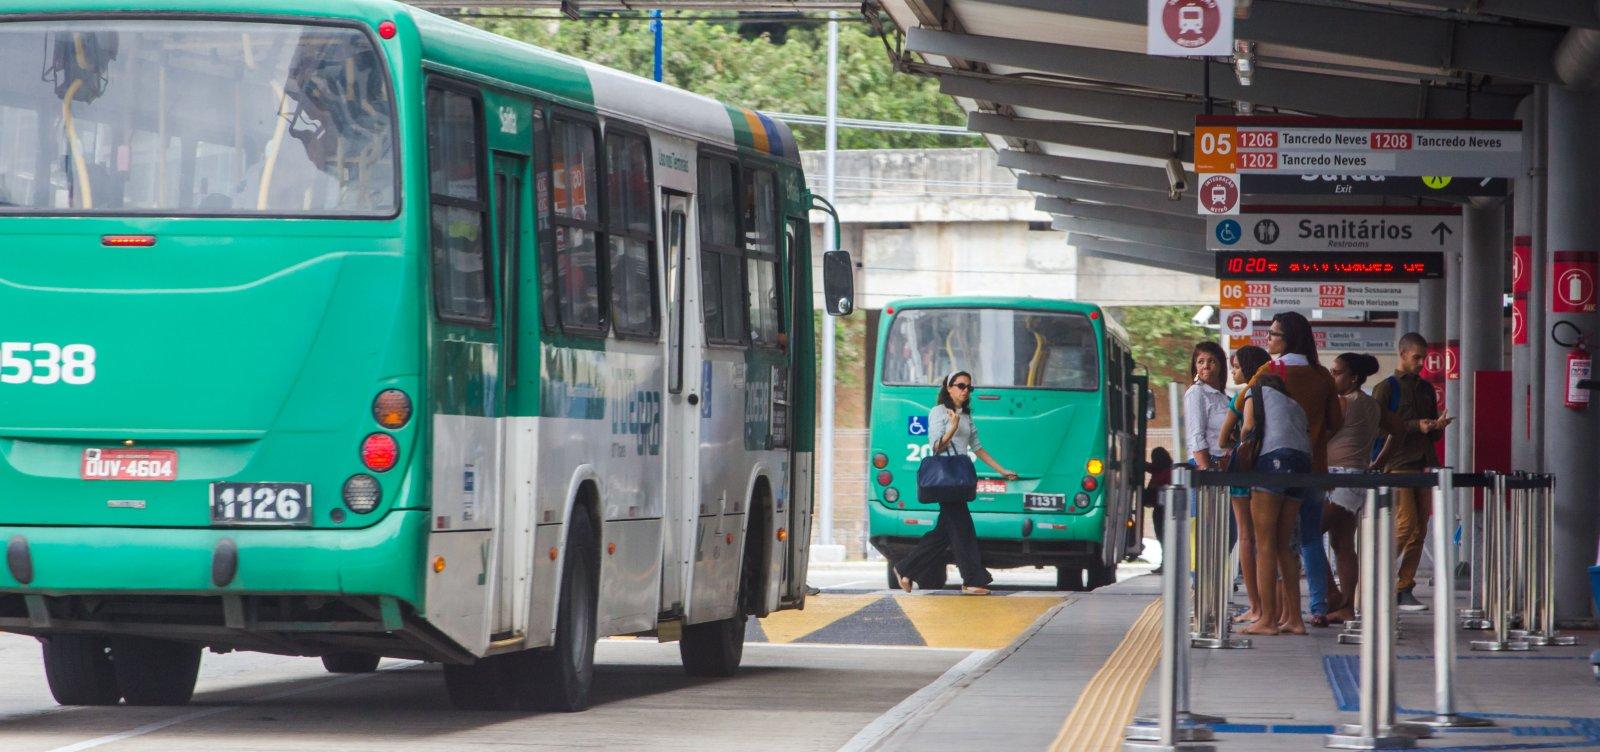 [Dauster cobra corte de linhas de ônibus para reduzir tarifa; Mota rebate]